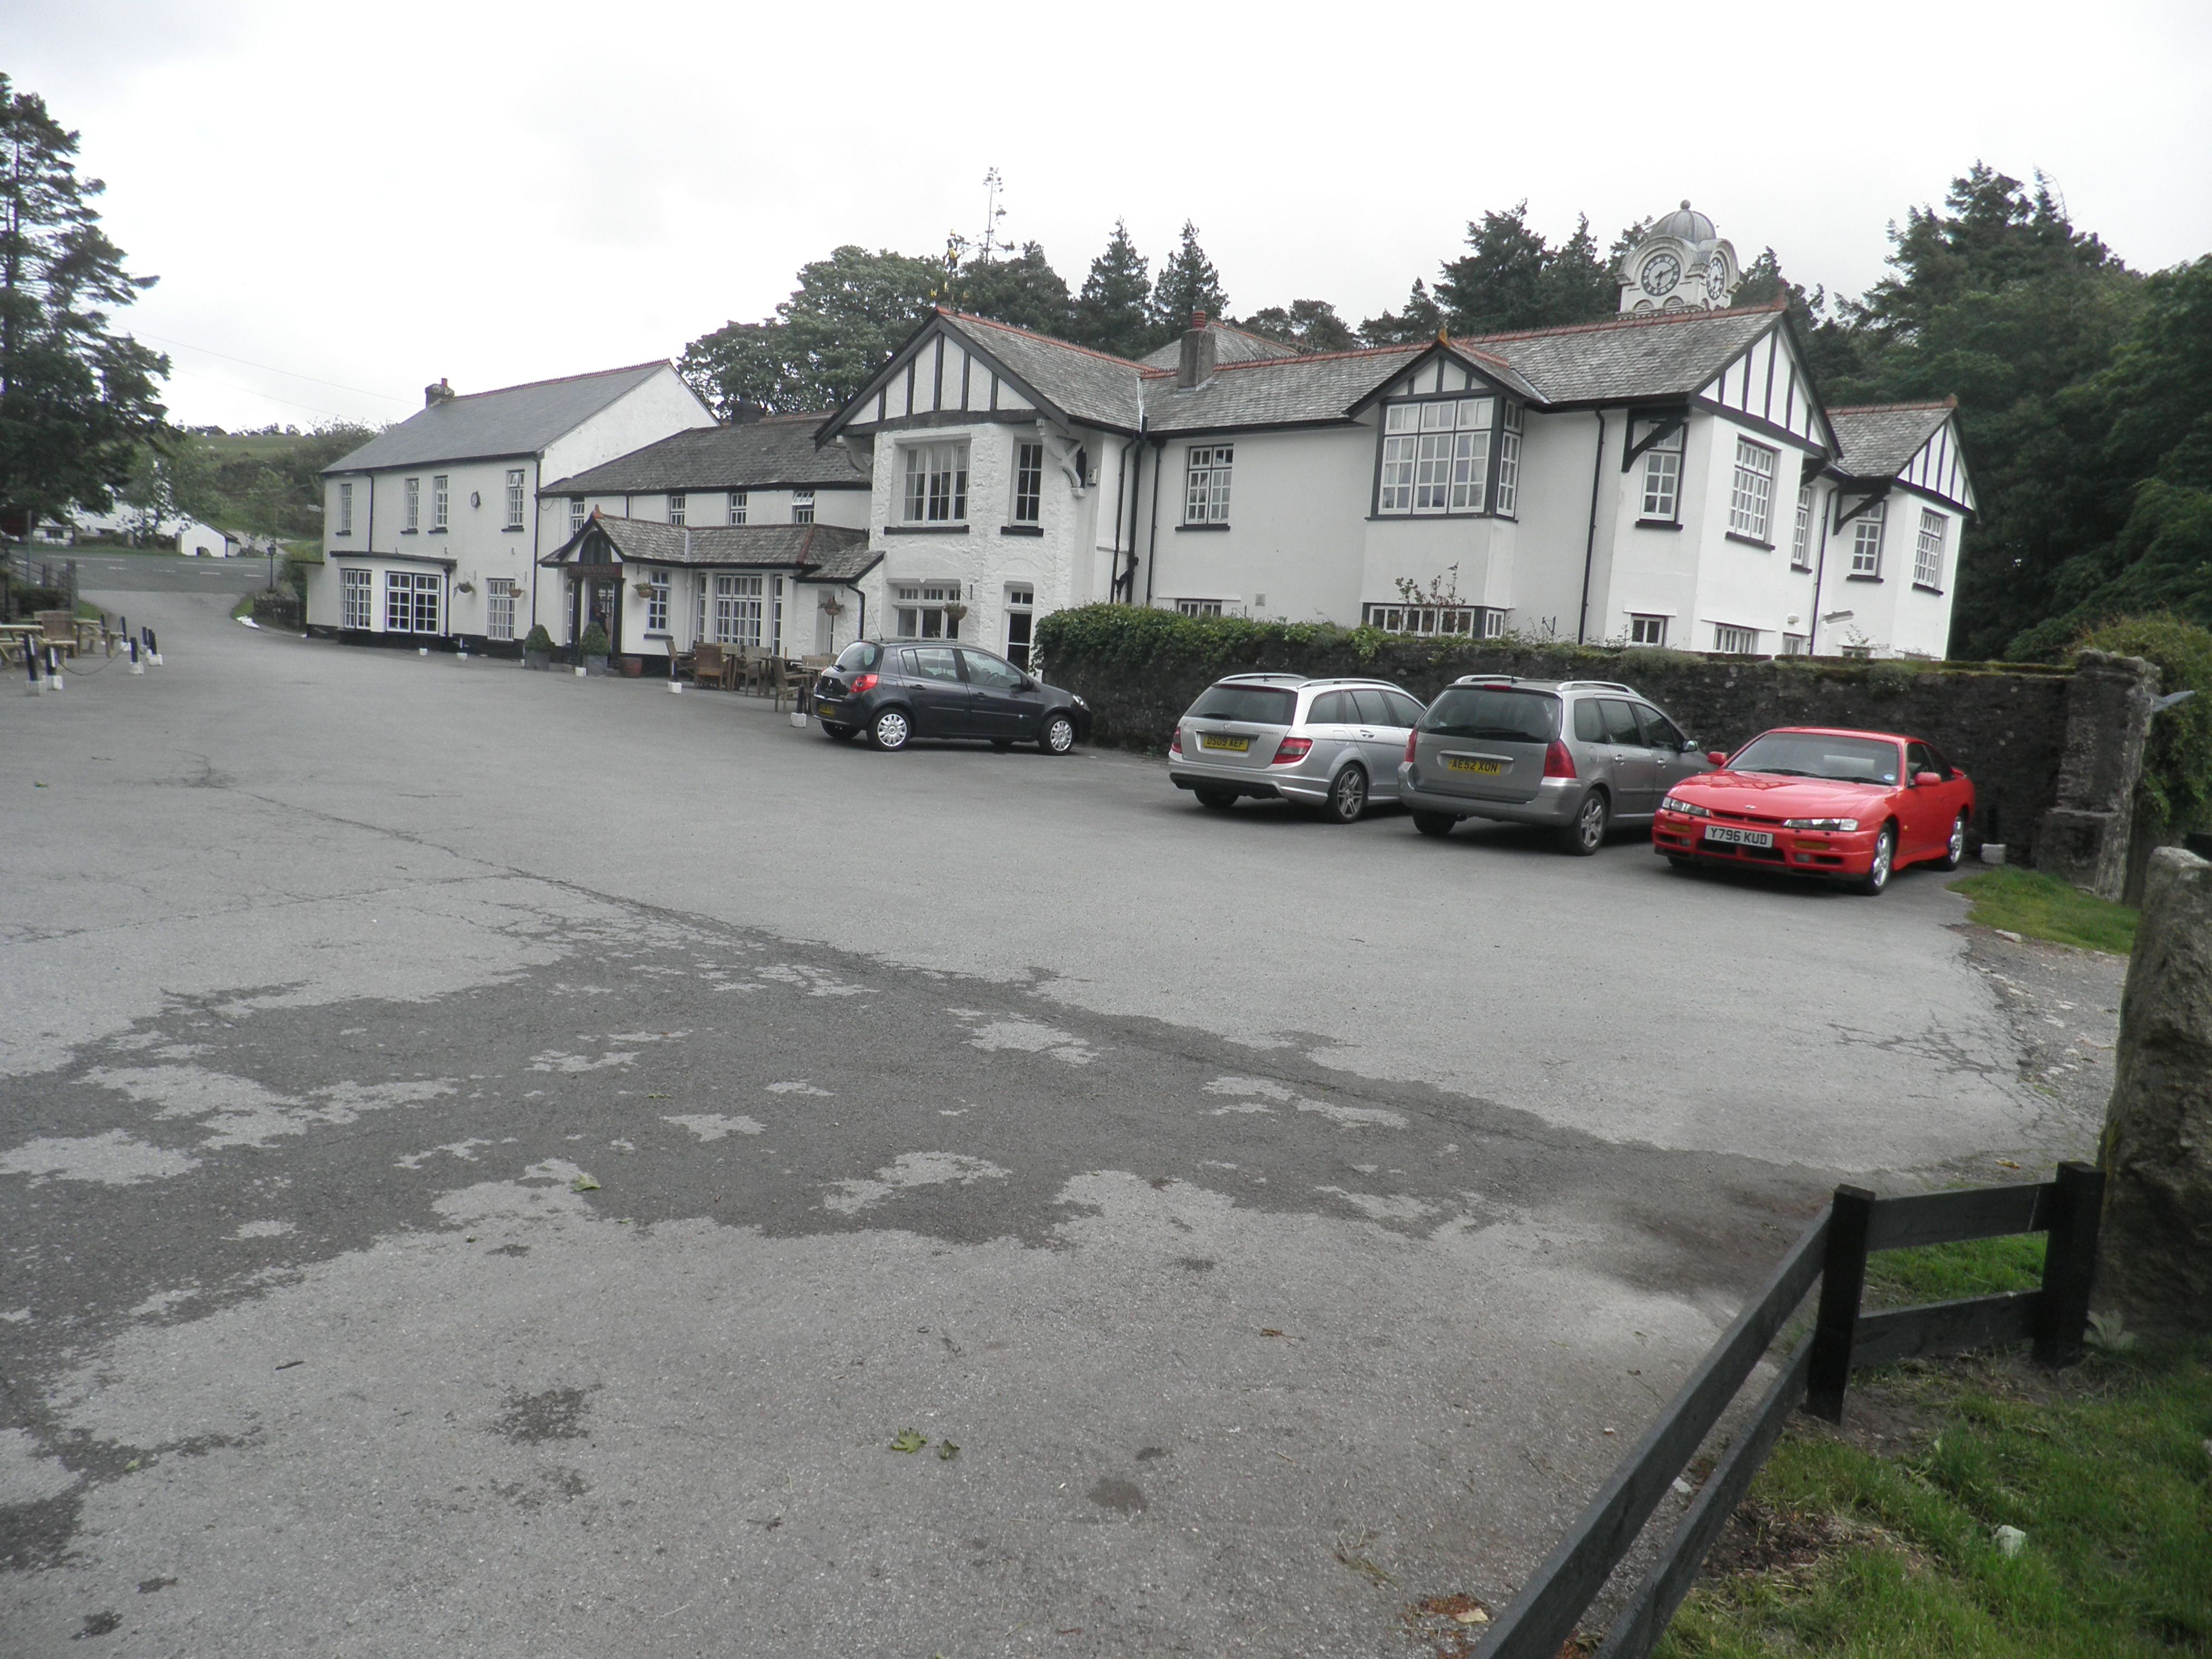 We stayed one night at Two Bridges Hotel in Dartmoor, Devon, England.